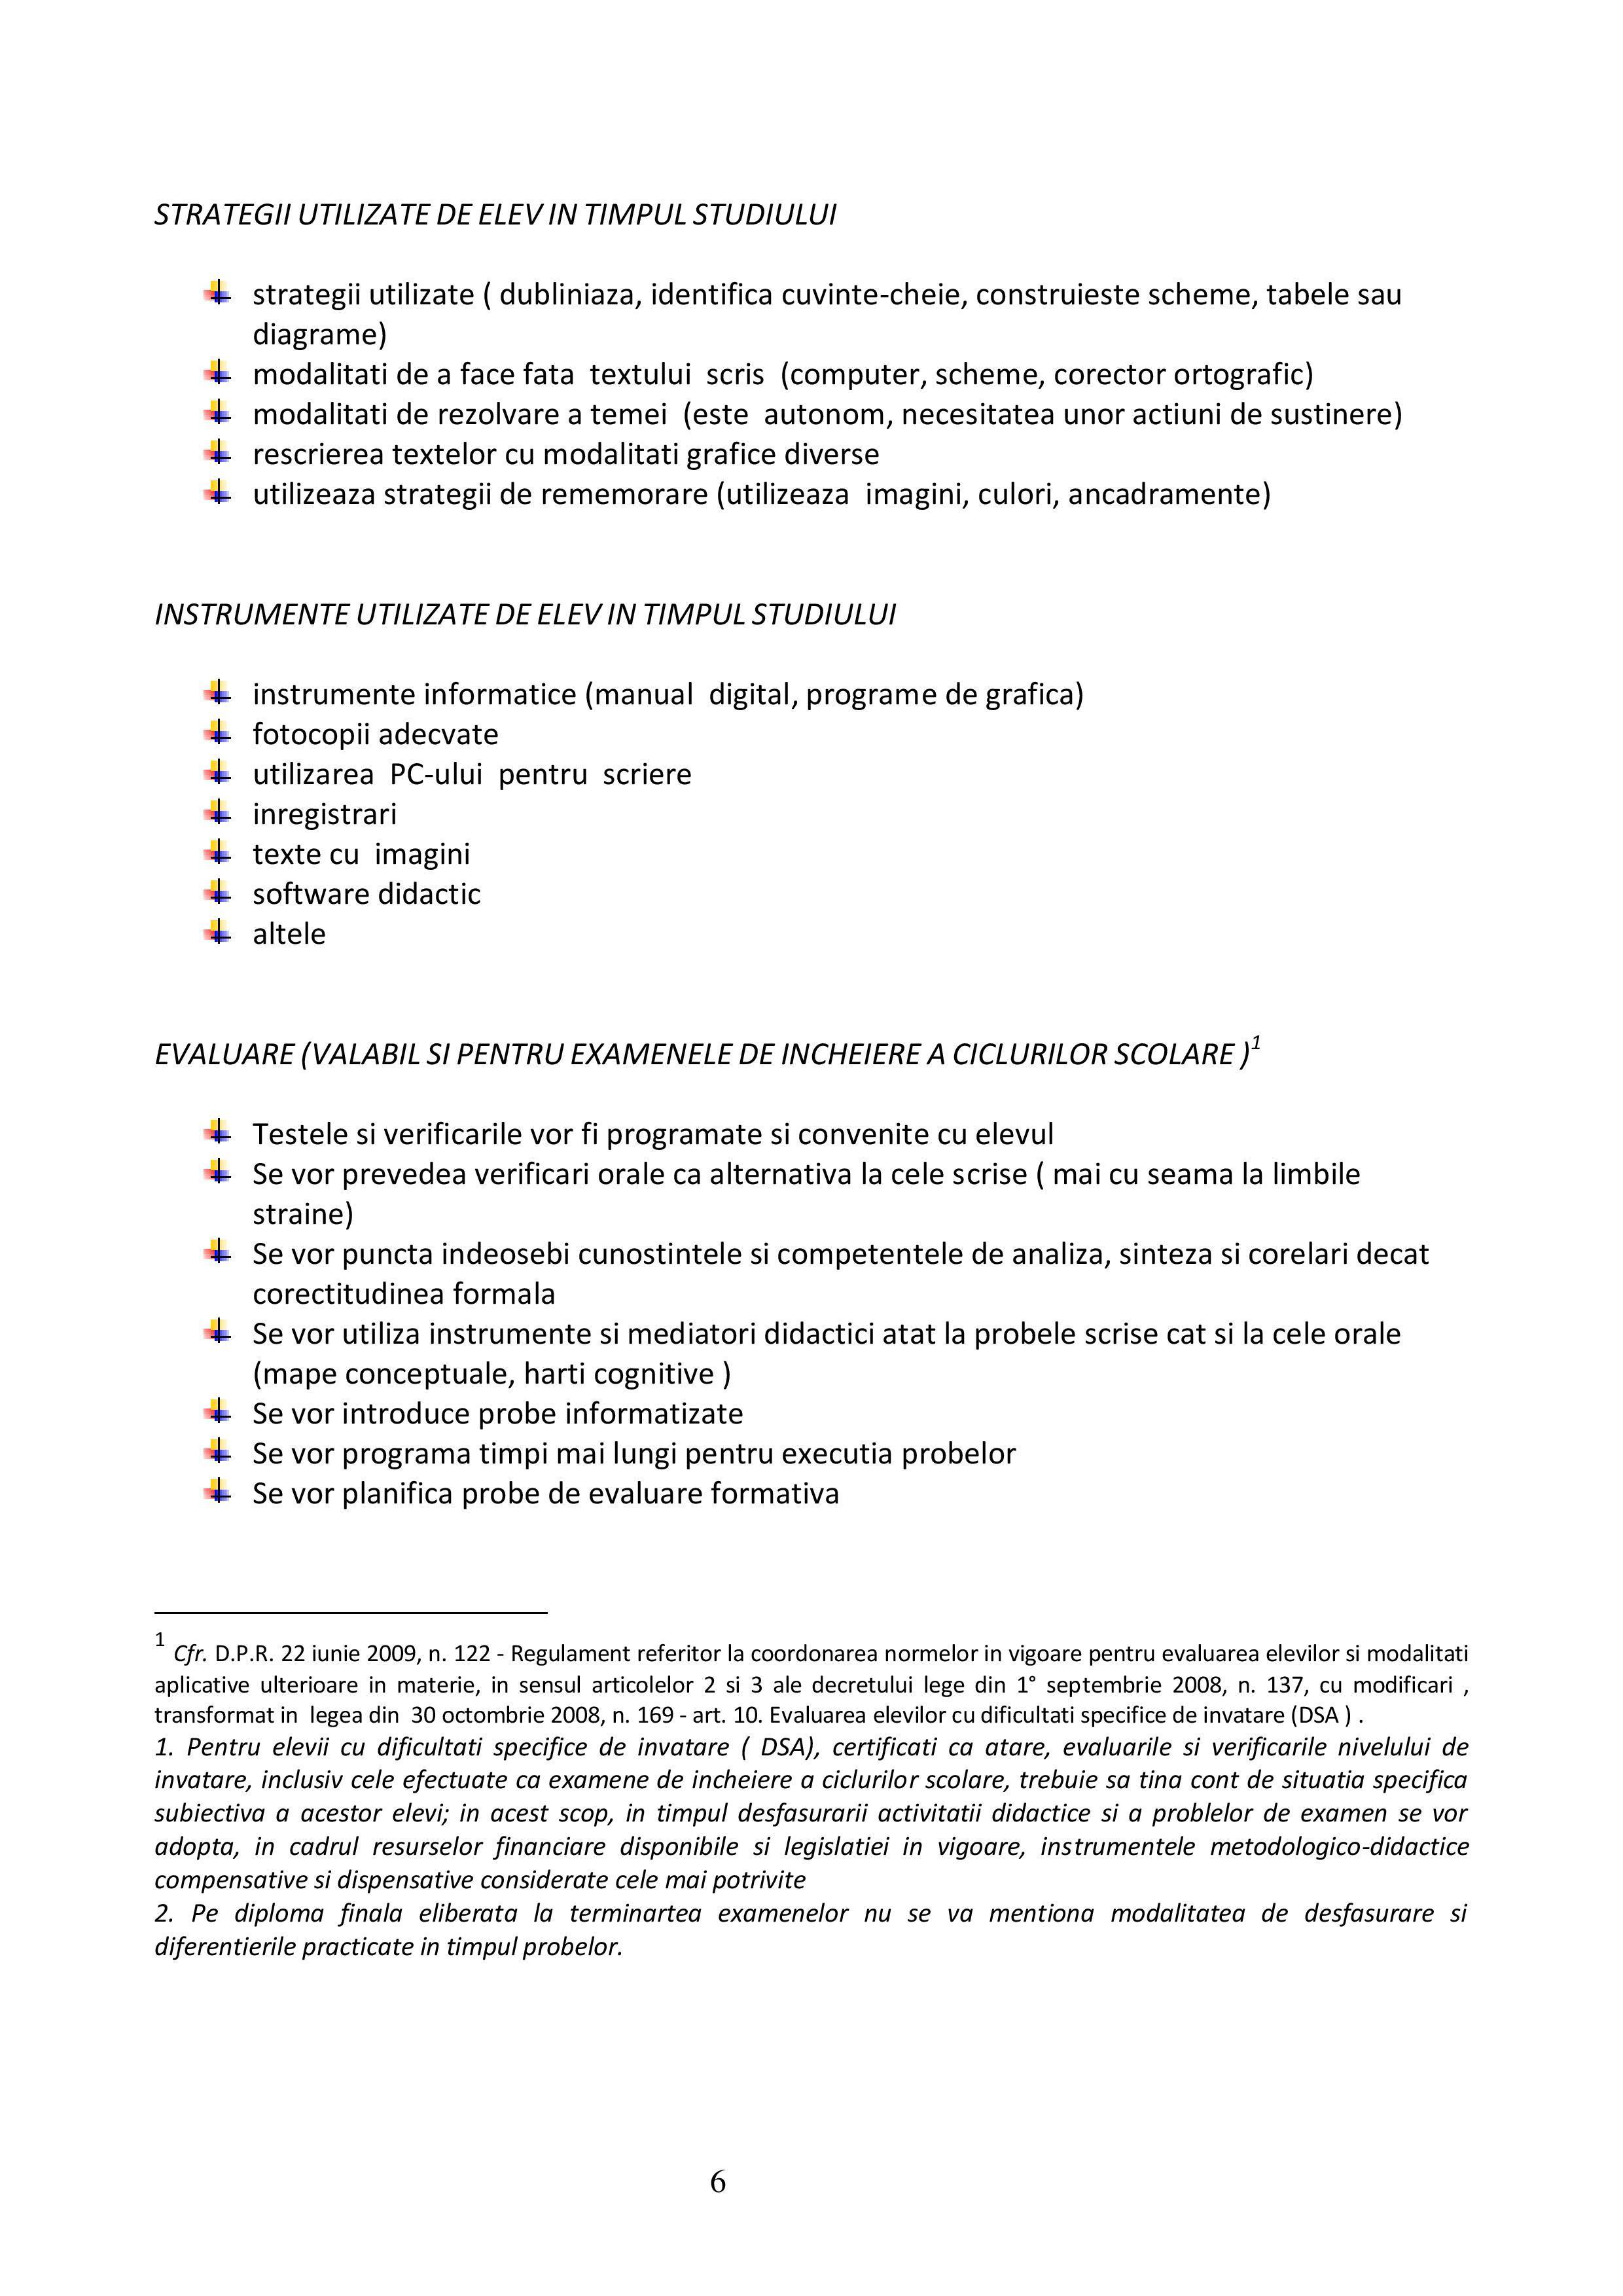 plan didactic personalizat dsilexie secondaria italia.doc versiune lb romana-page-006